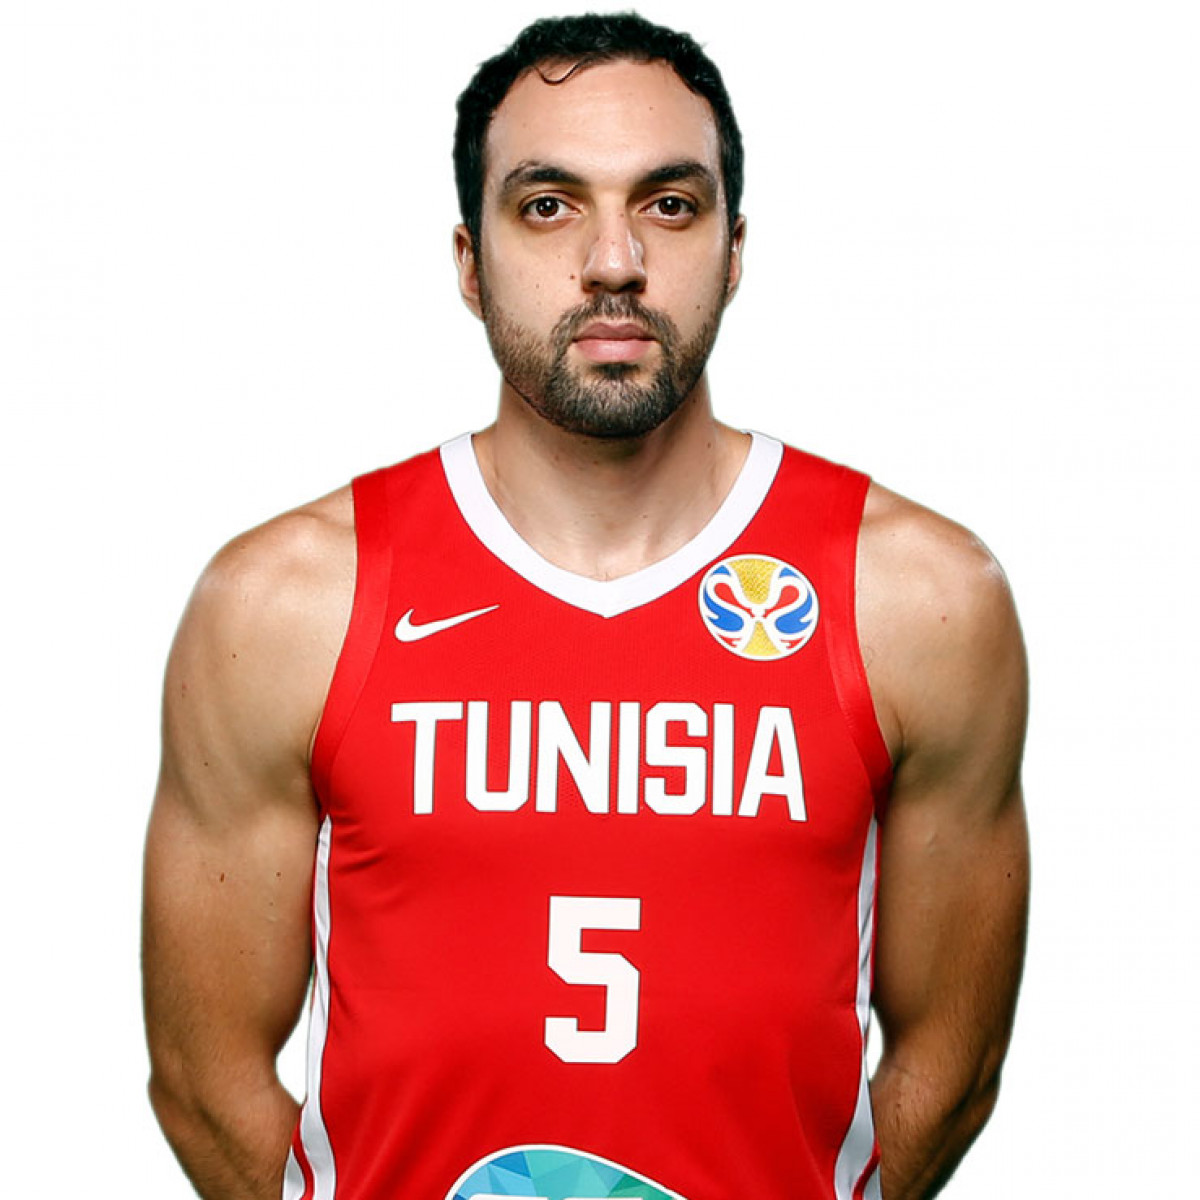 Photo of Ziyed Chennoufi, 2019-2020 season